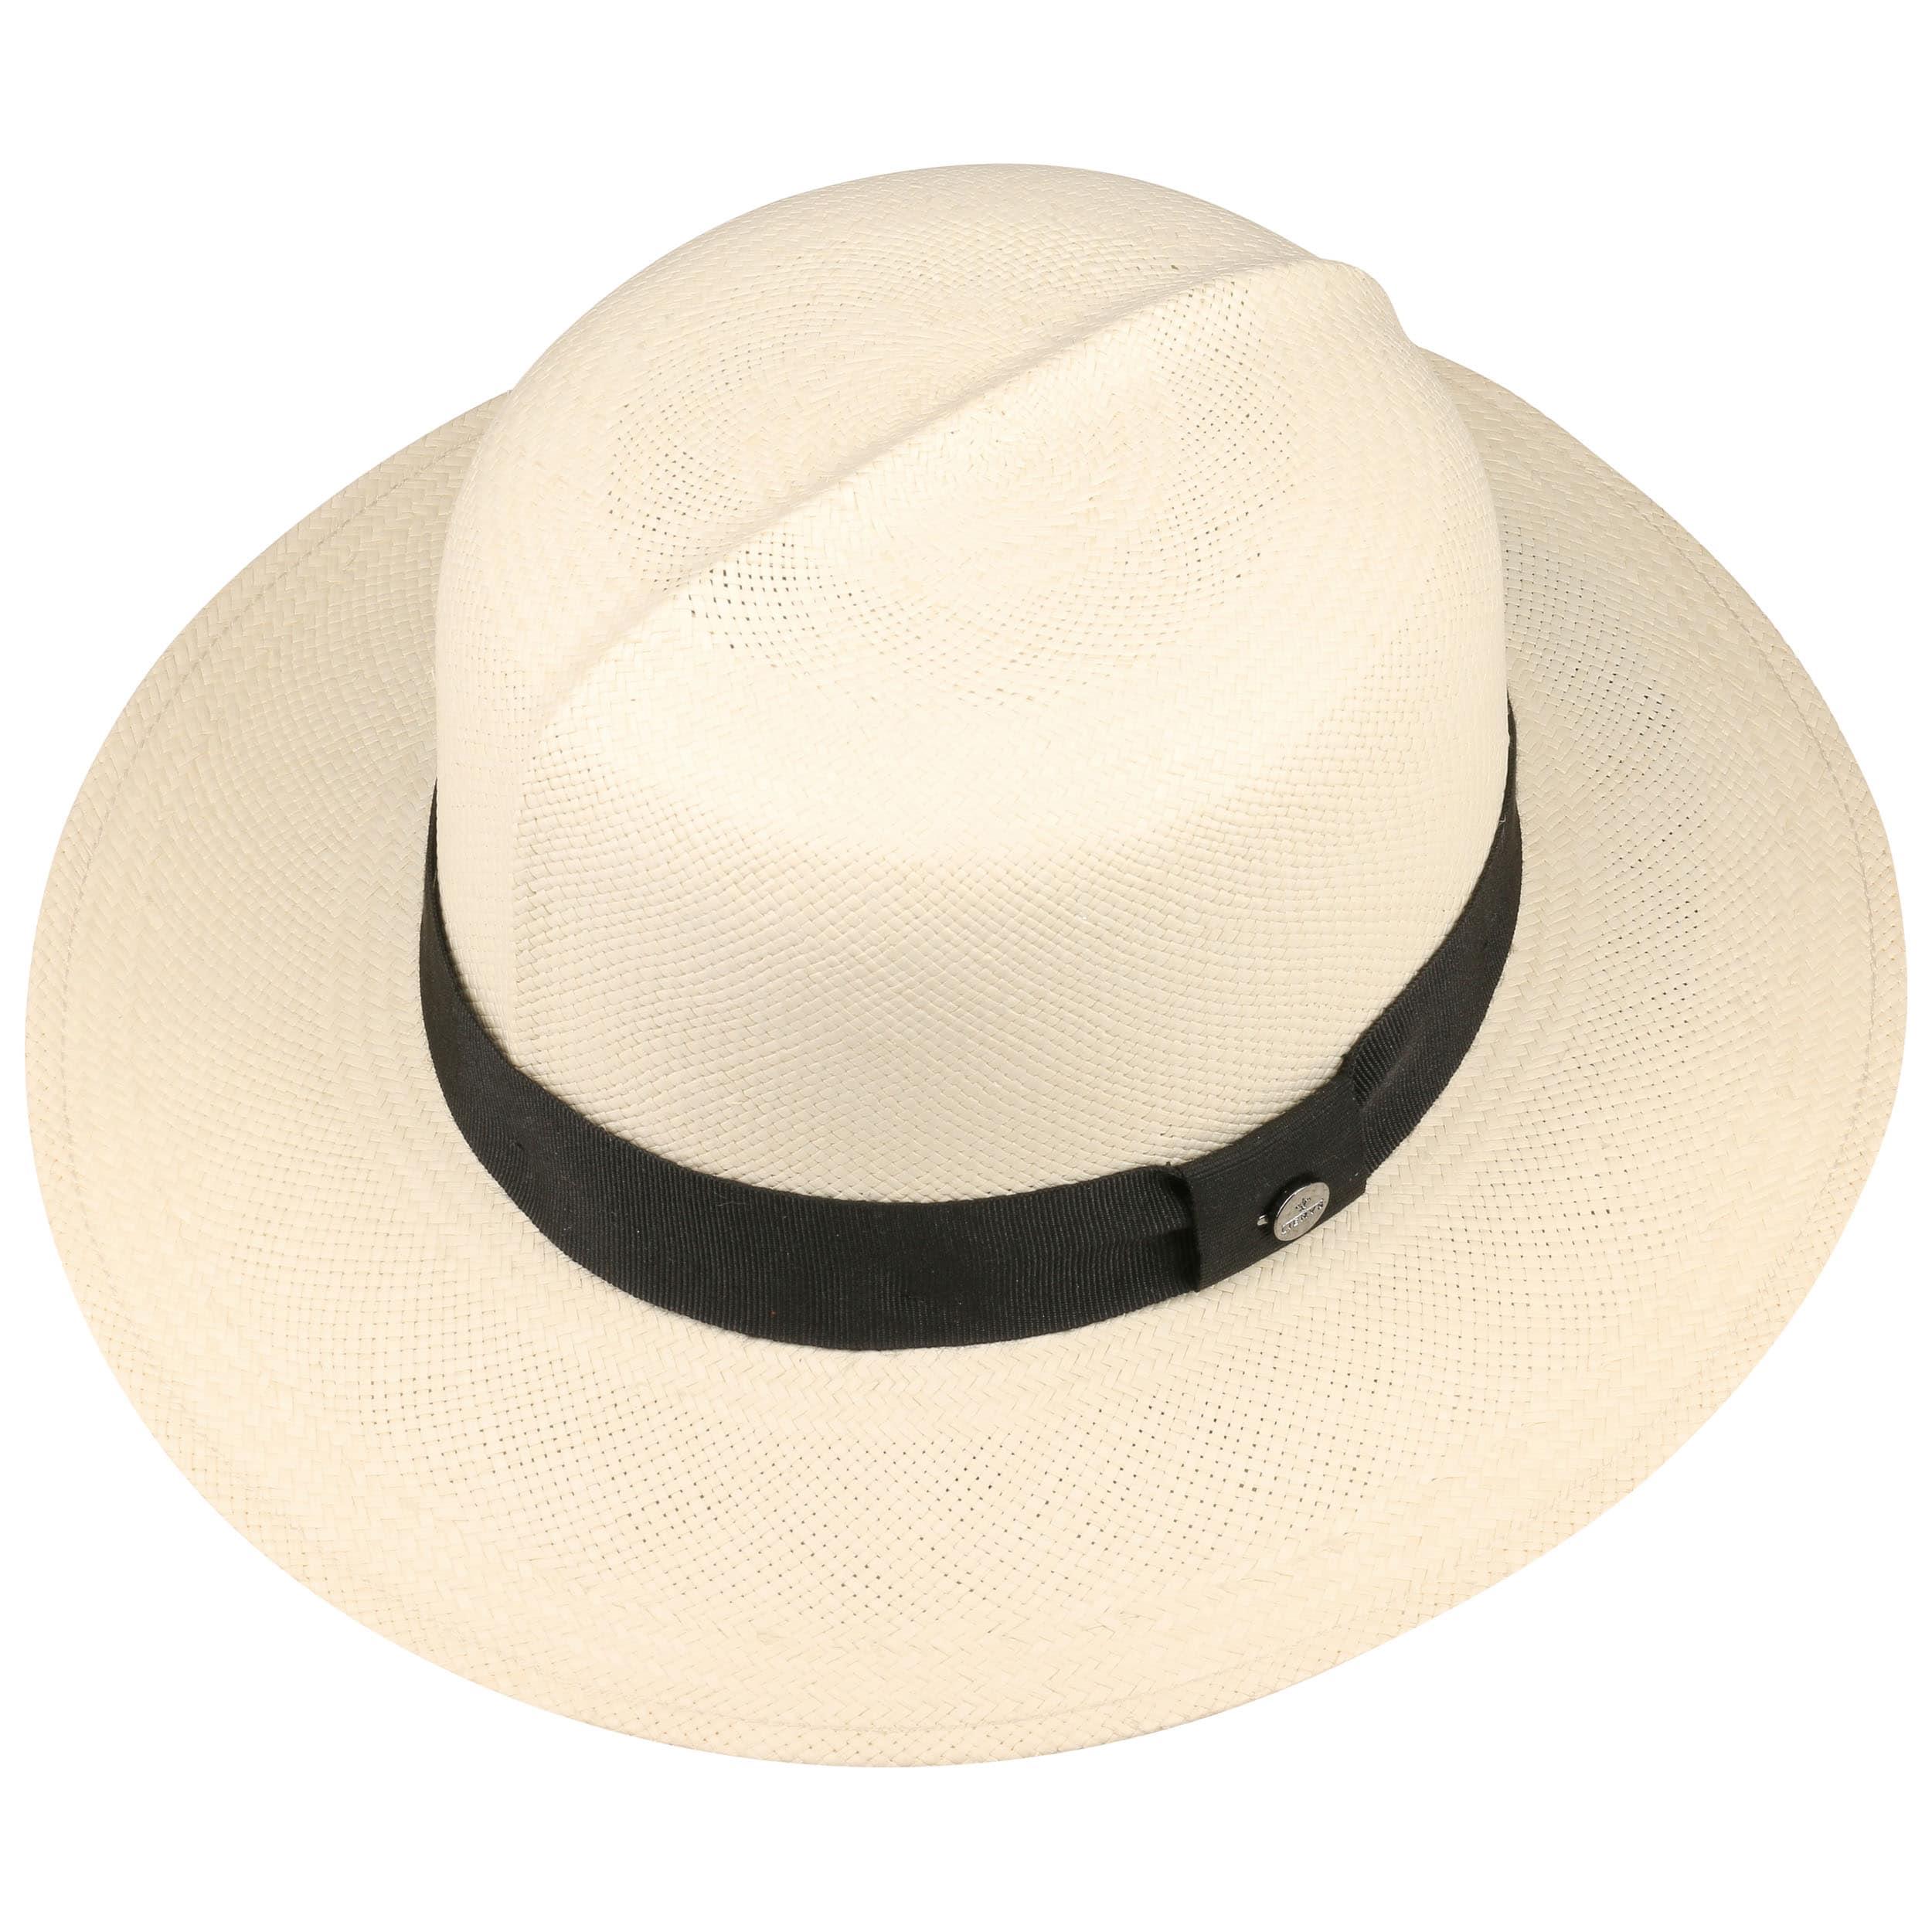 e782f104c2863e Colonial Panama Hat by Lierys - white 1 ...